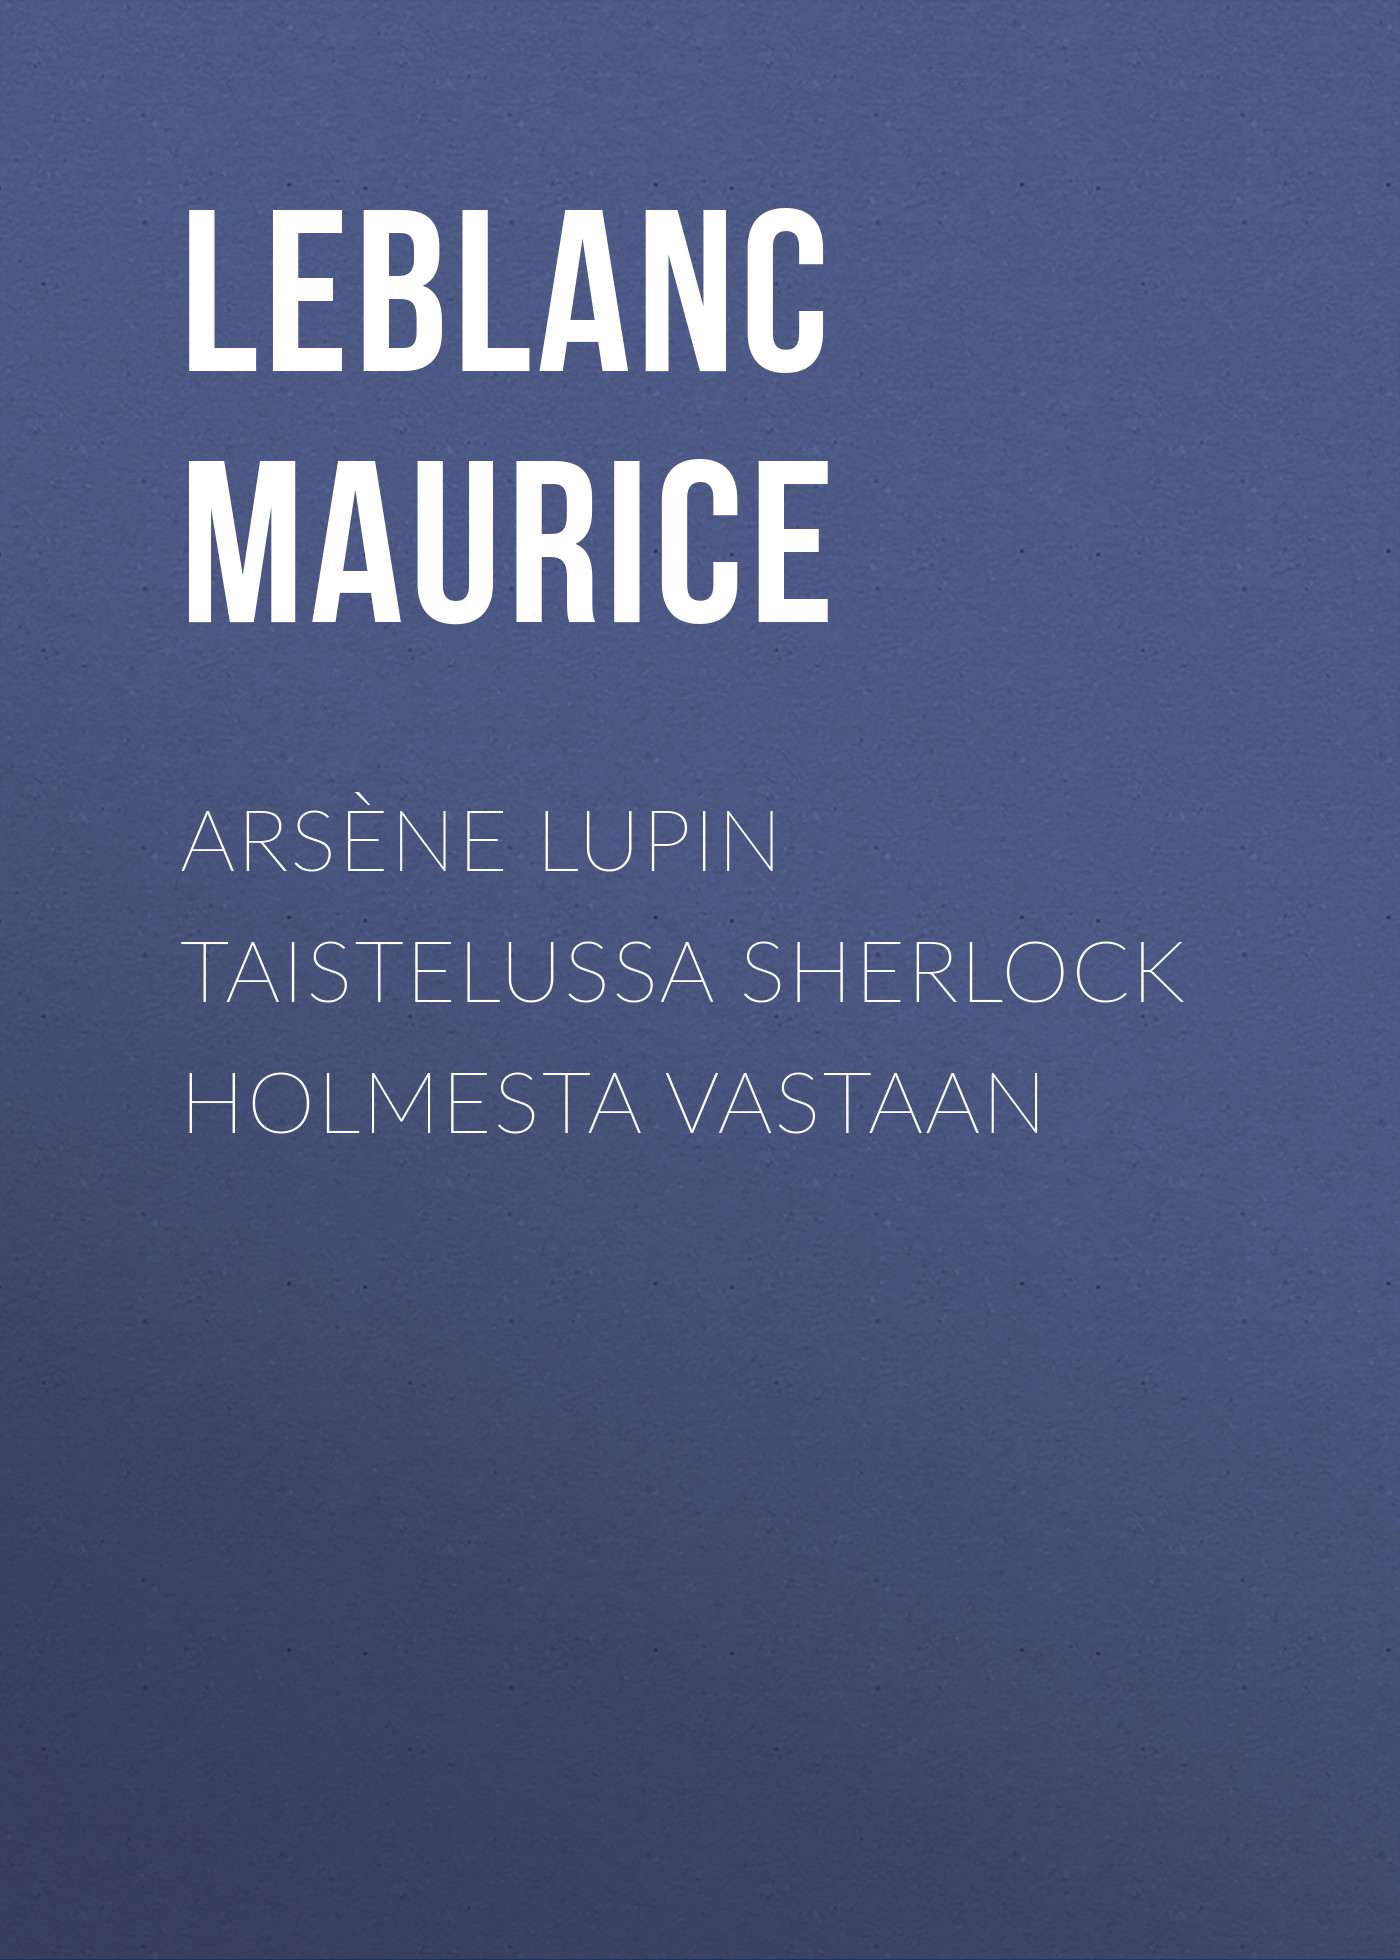 лучшая цена Leblanc Maurice Arsène Lupin taistelussa Sherlock Holmesta vastaan